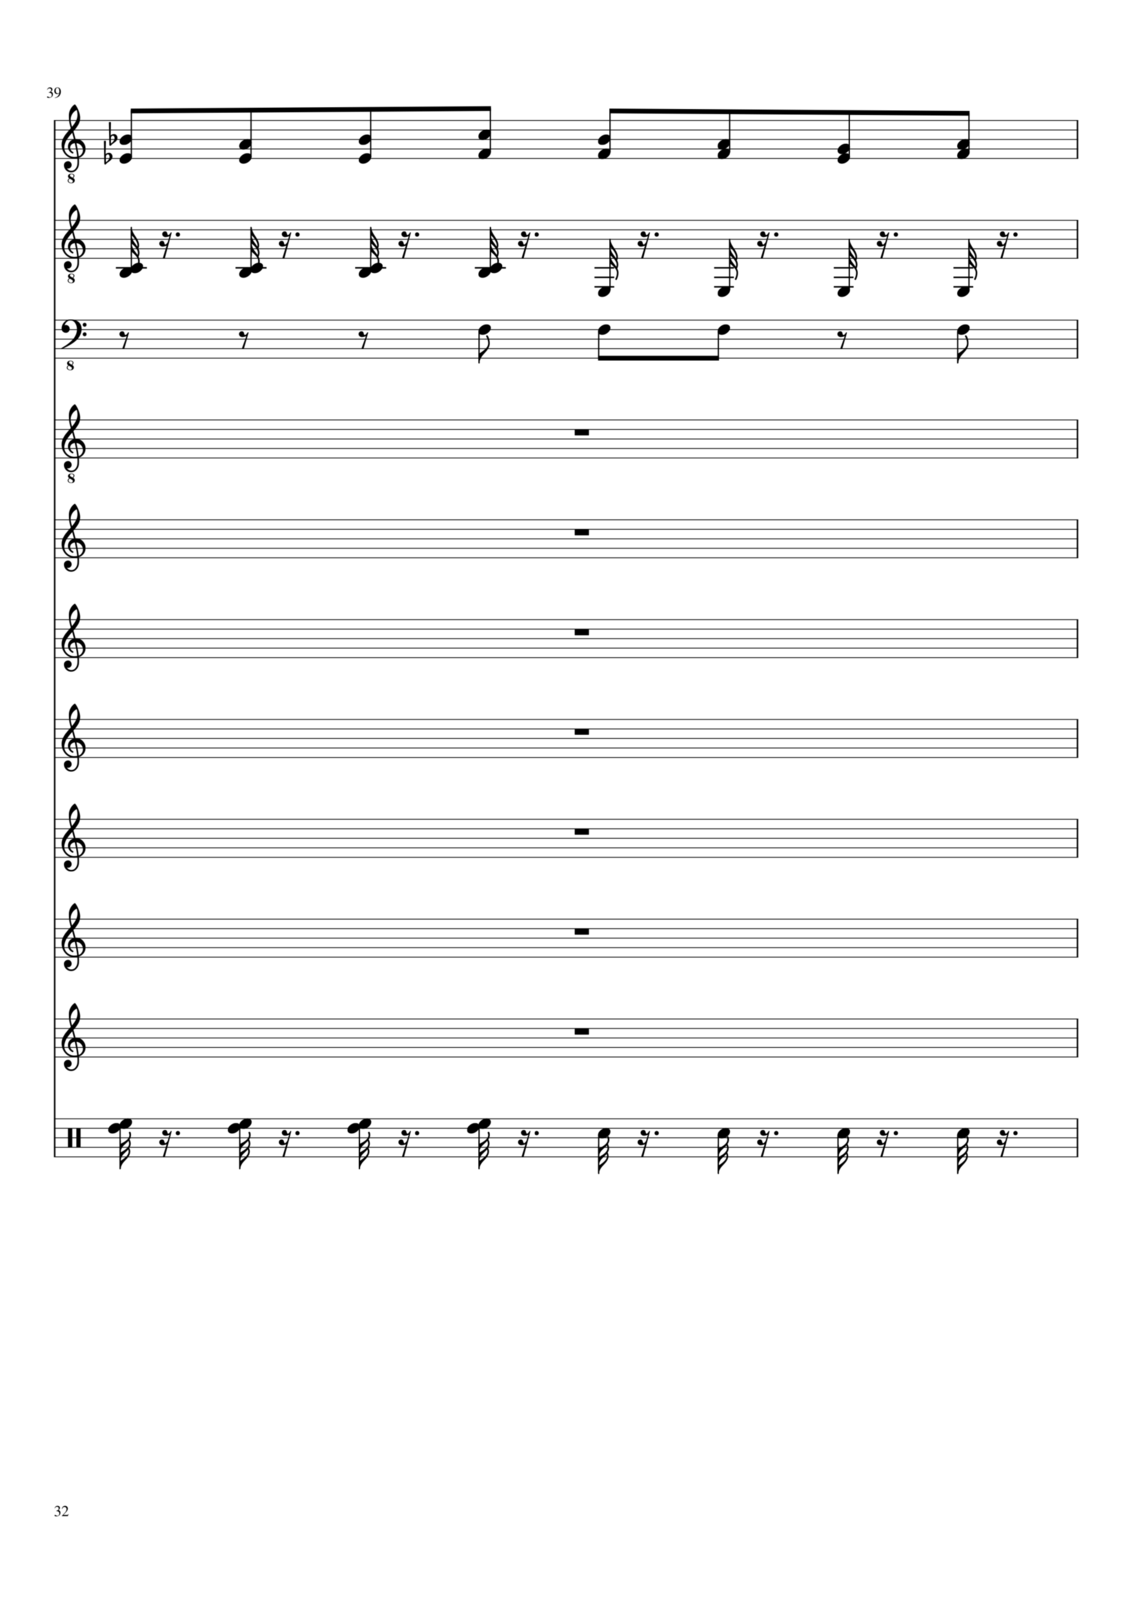 Belyiy sokol slide, Image 32